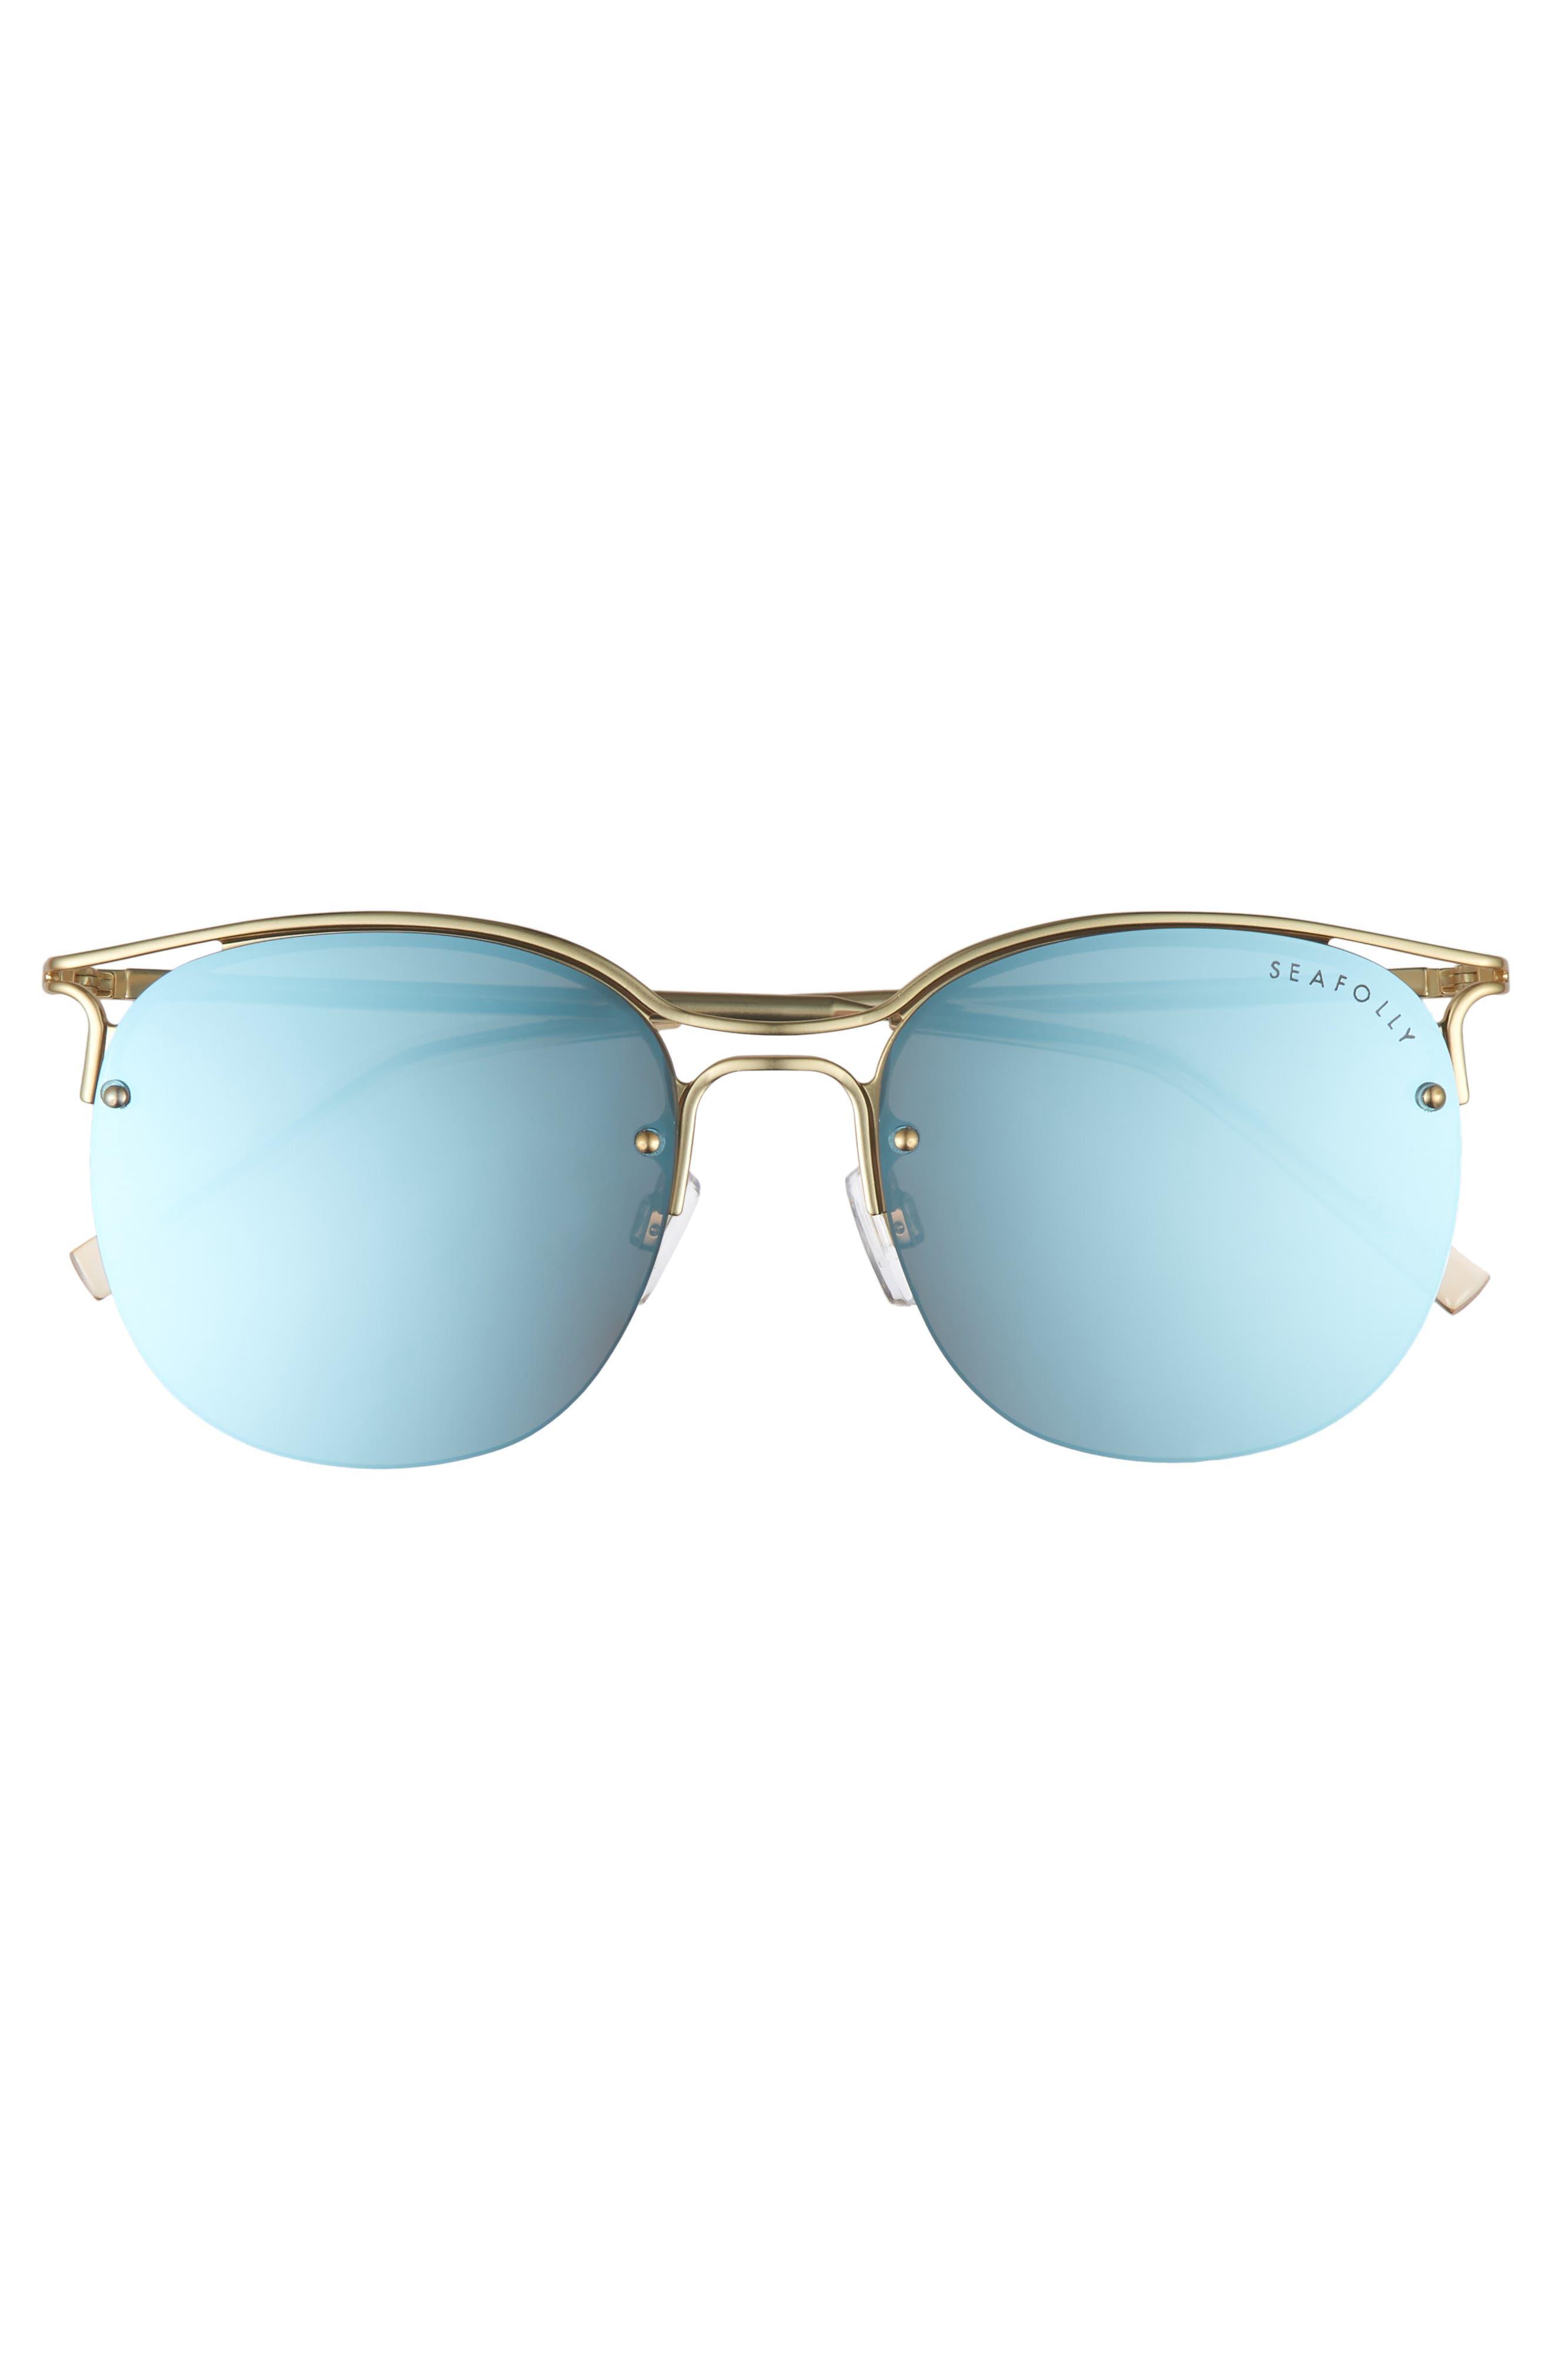 Freshwater 55m Metal Sunglasses,                             Alternate thumbnail 6, color,